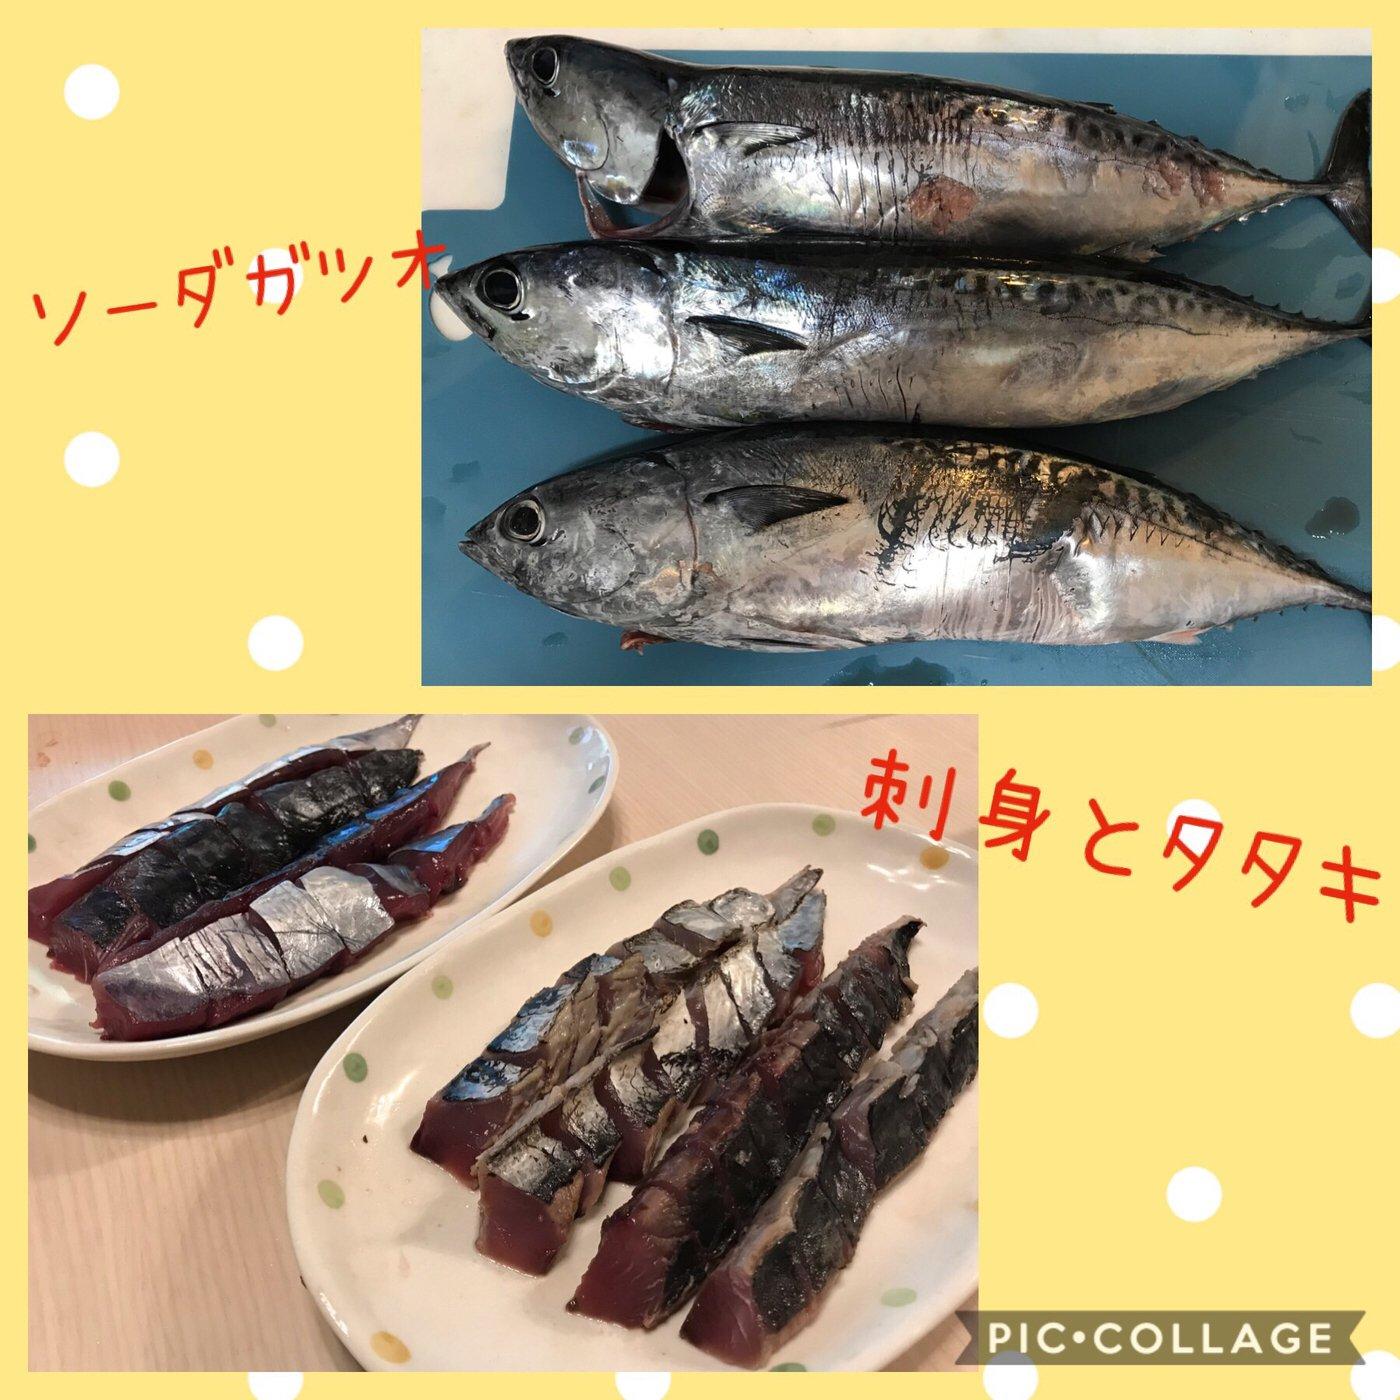 Hideyuki Iizukaさんの投稿画像